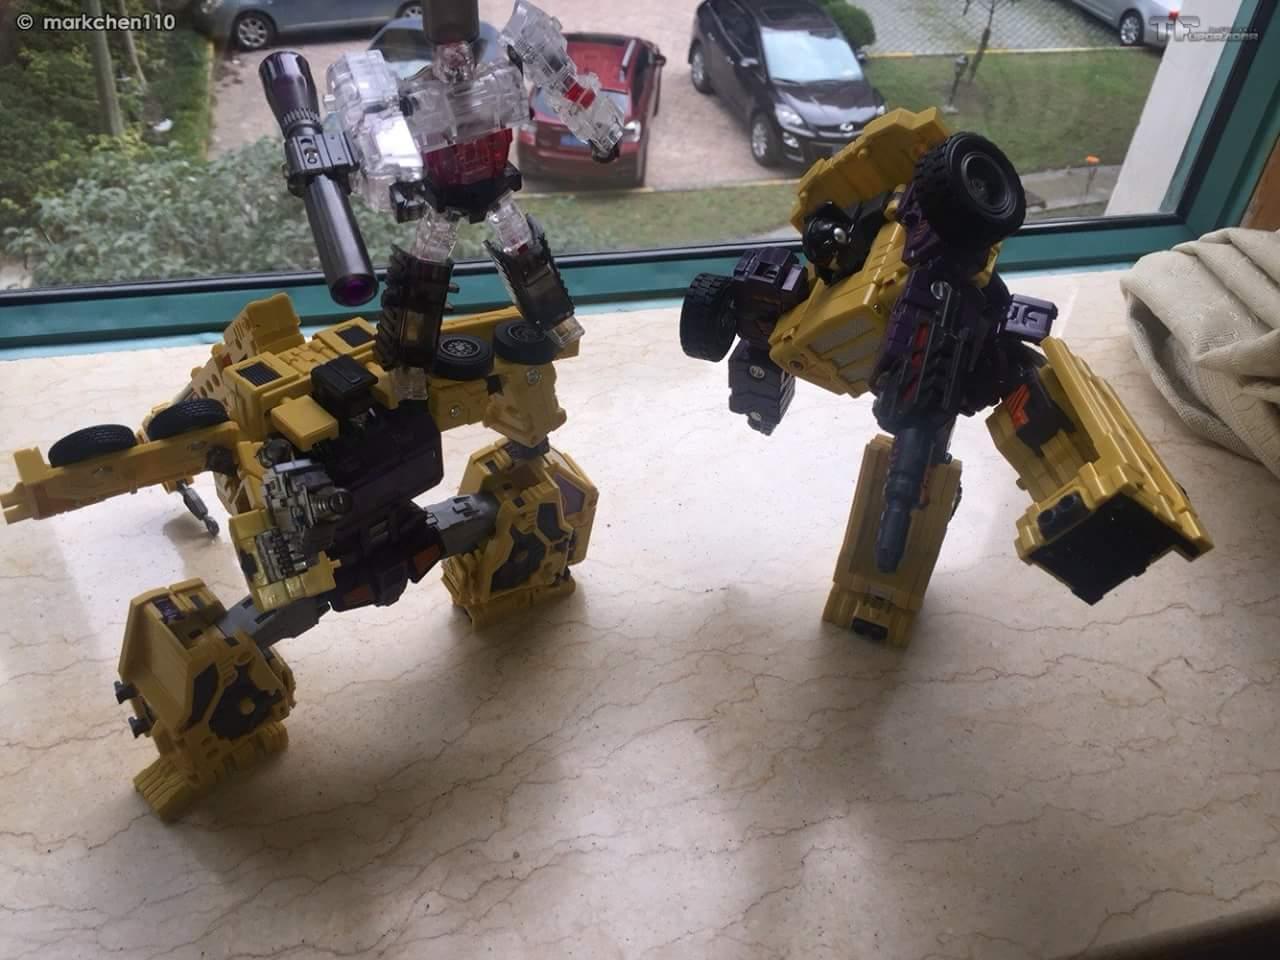 [Toyworld] Produit Tiers - Jouet TW-C Constructor aka Devastator/Dévastateur (Version vert G1 et jaune G2) - Page 8 RGDBNq7h